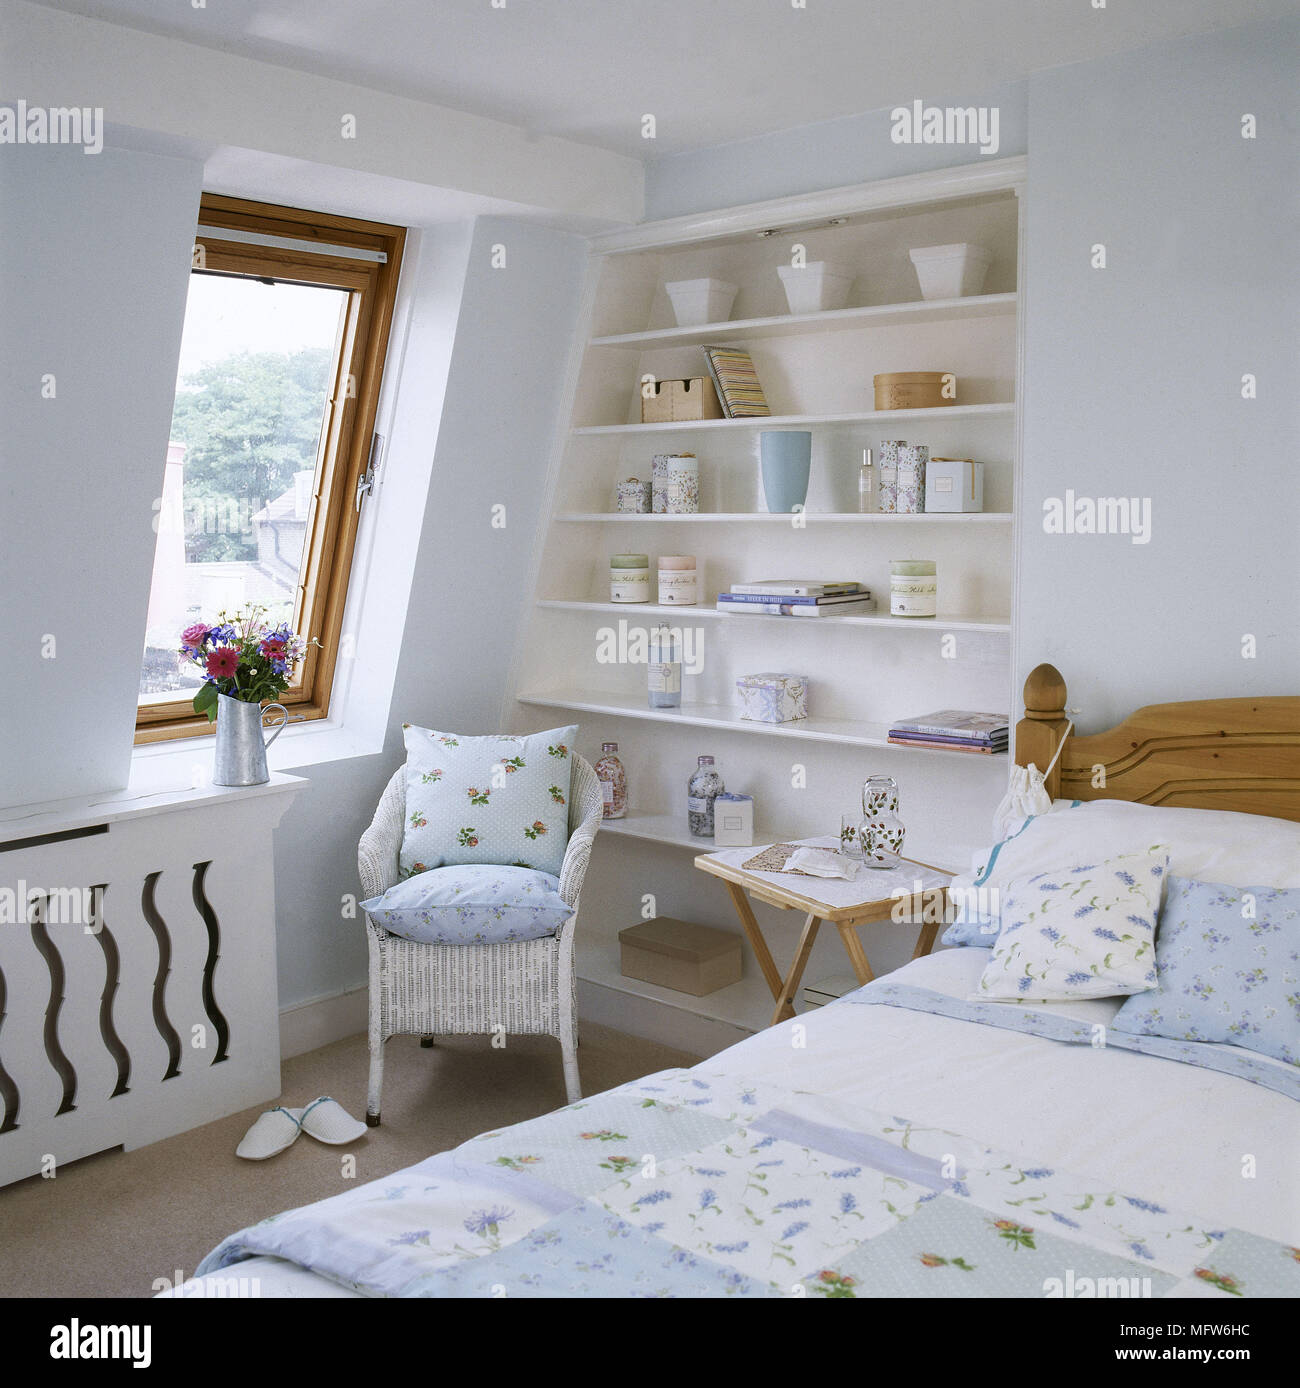 Doppelbett Und Lloyd Loom Rattan Sessel Mit Kissen Mit Blumenmuster